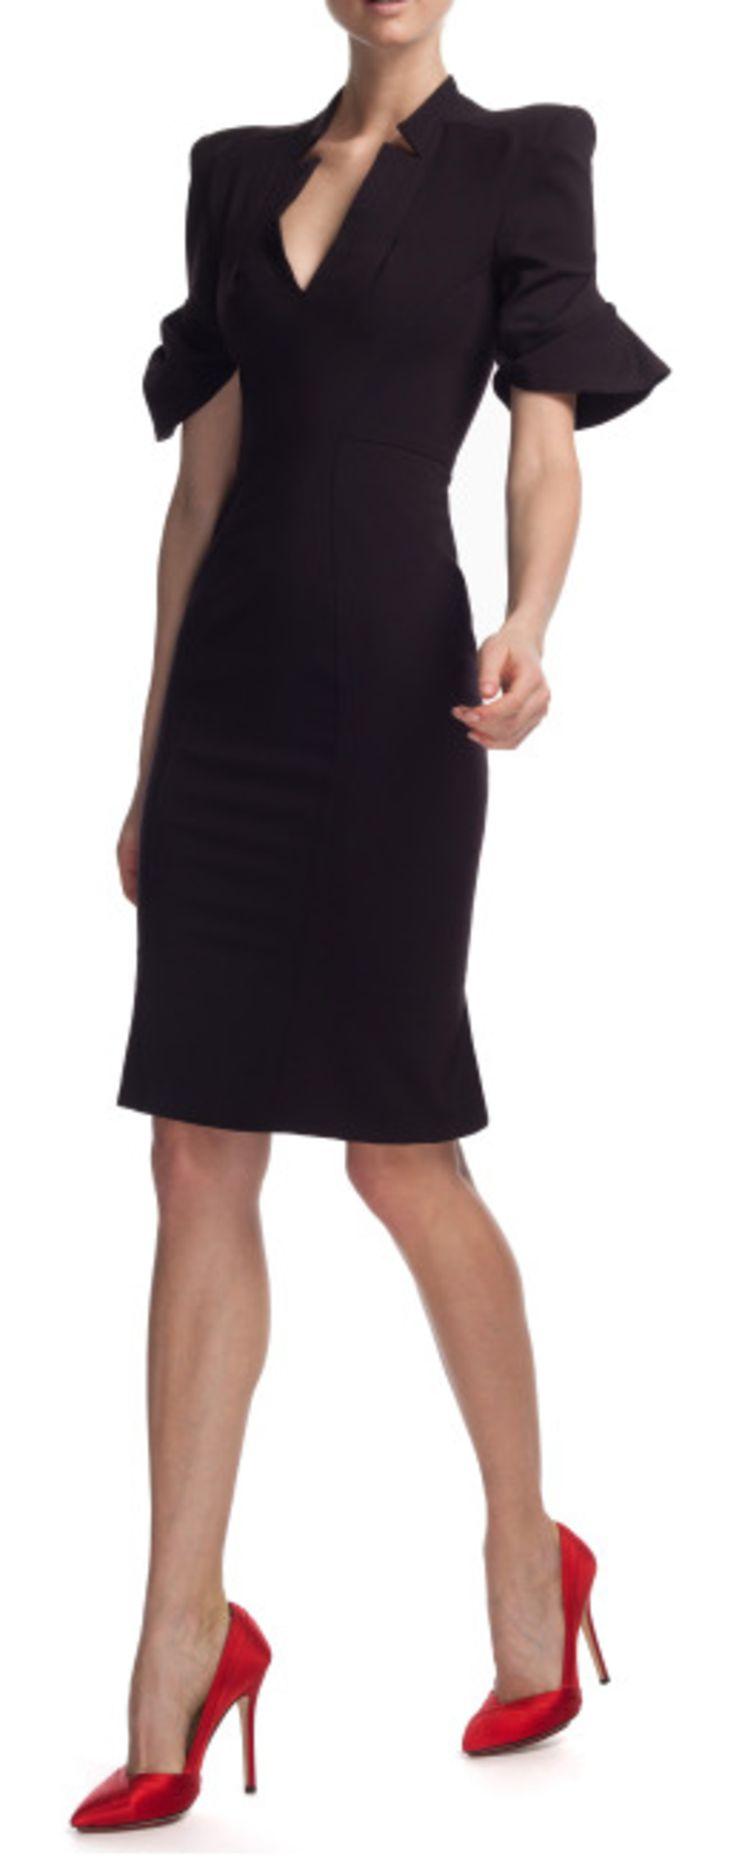 ZAC POSEN DRESS @Michelle Flynn Flynn Flynn Coleman-HERS